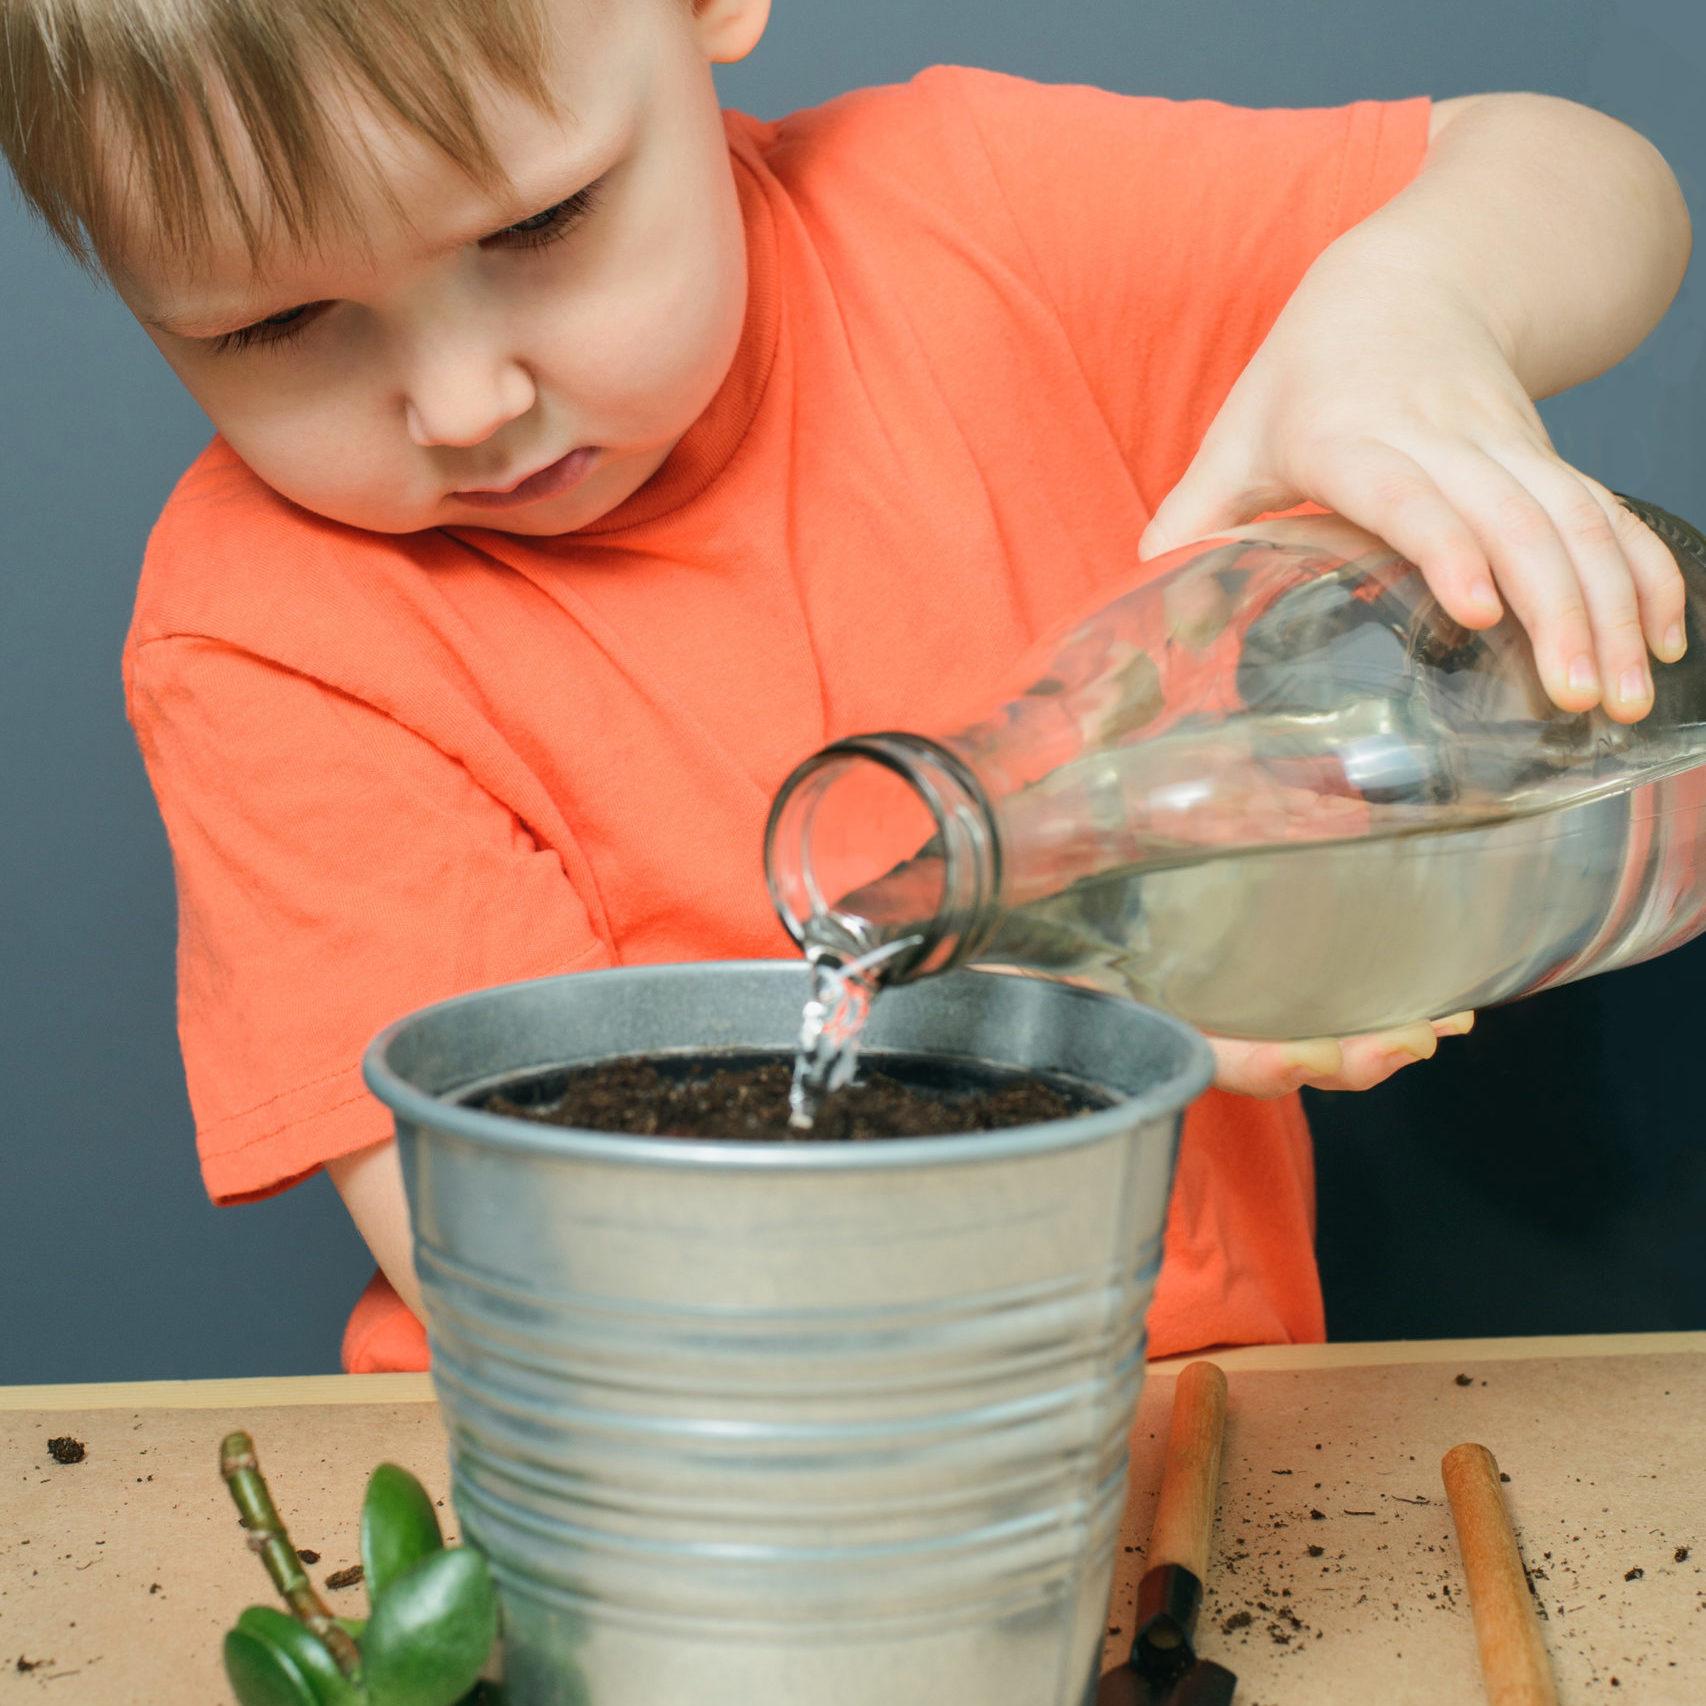 caucasian blond child boy watering ground for planting money tree plant or crassula ovata in metal flower pot, indoor gardening, stock photo image